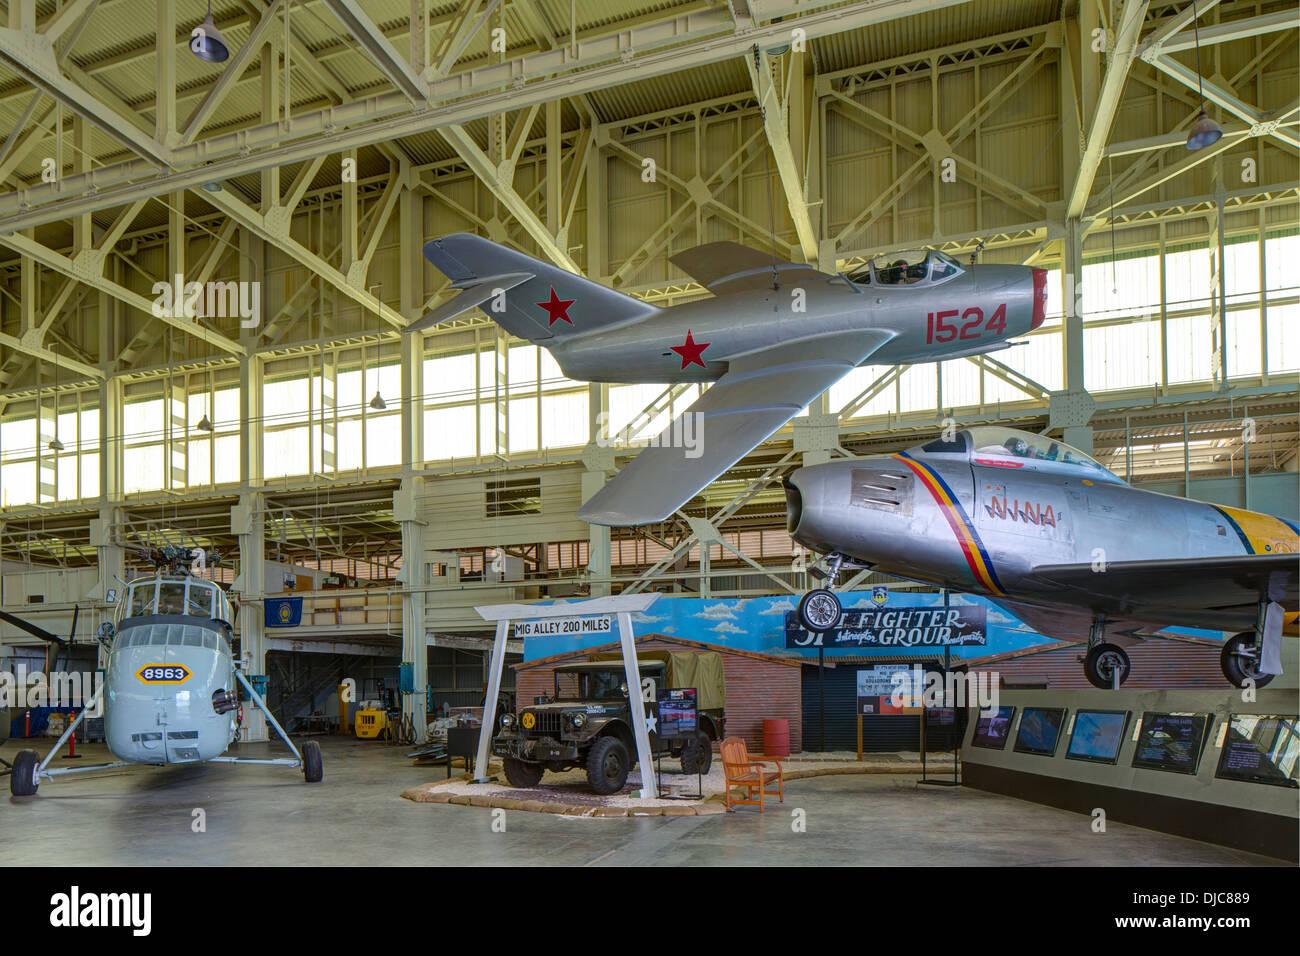 Pacific Aviation Museum Pearl Harbor, l'île de Ford, Honolulu, Oahu, Hawaii Photo Stock